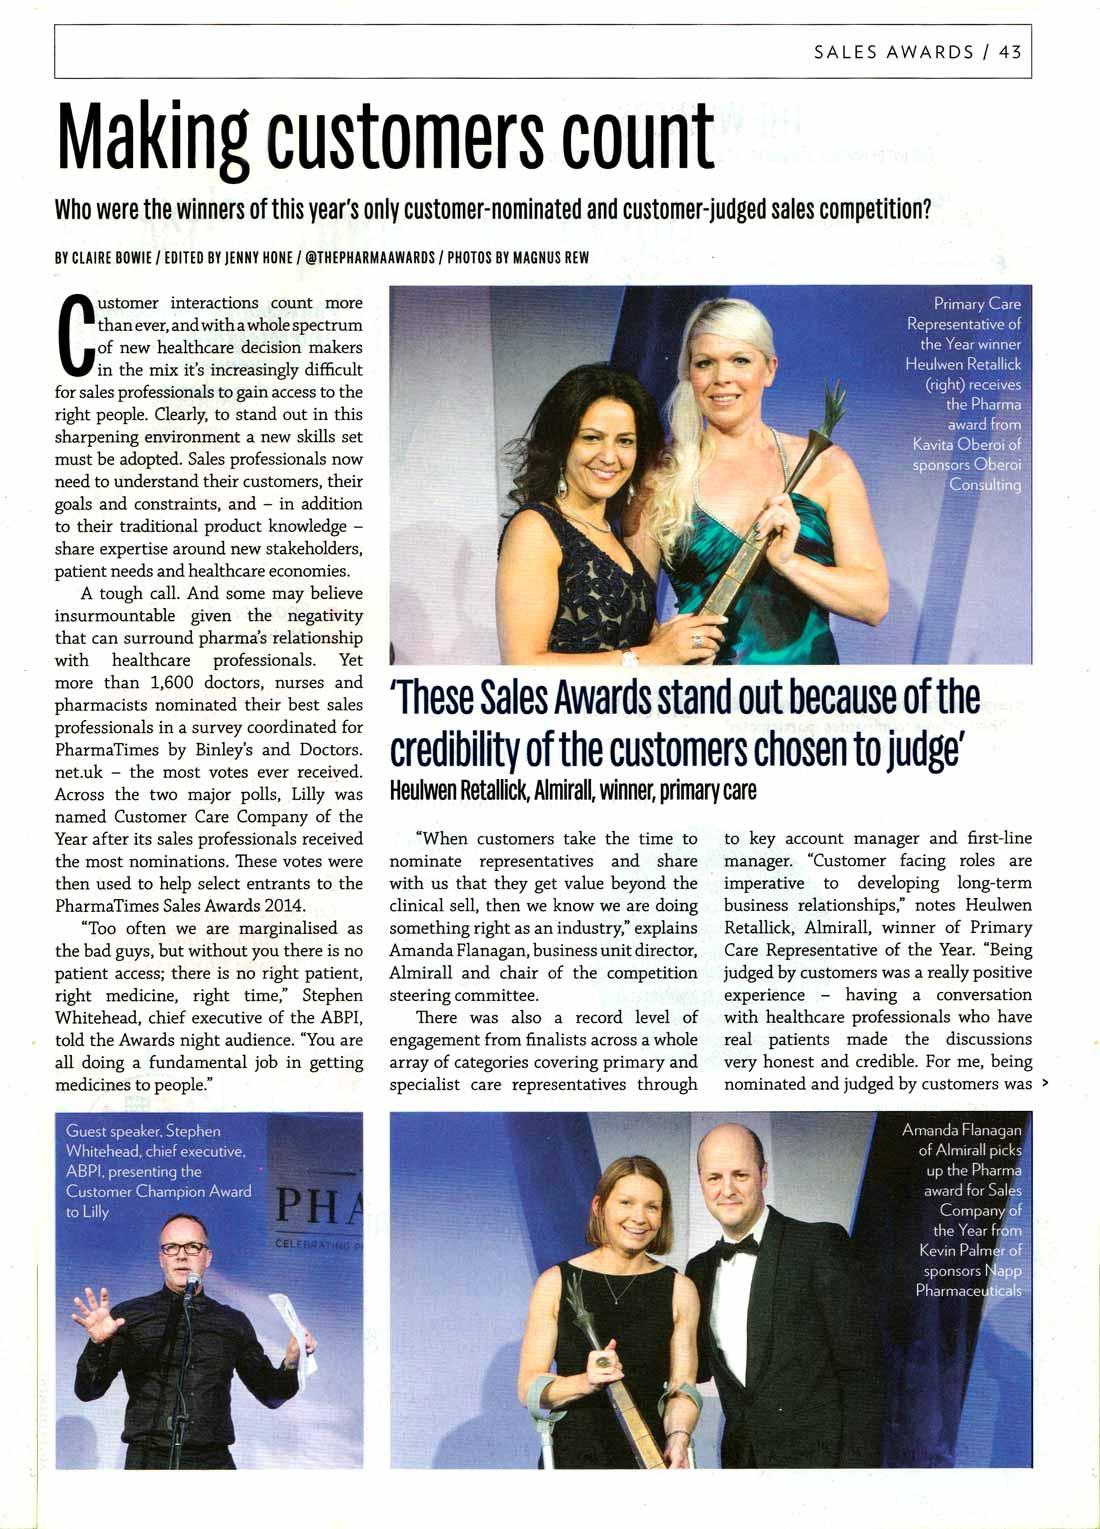 PharmaTimes - Primary Care Award